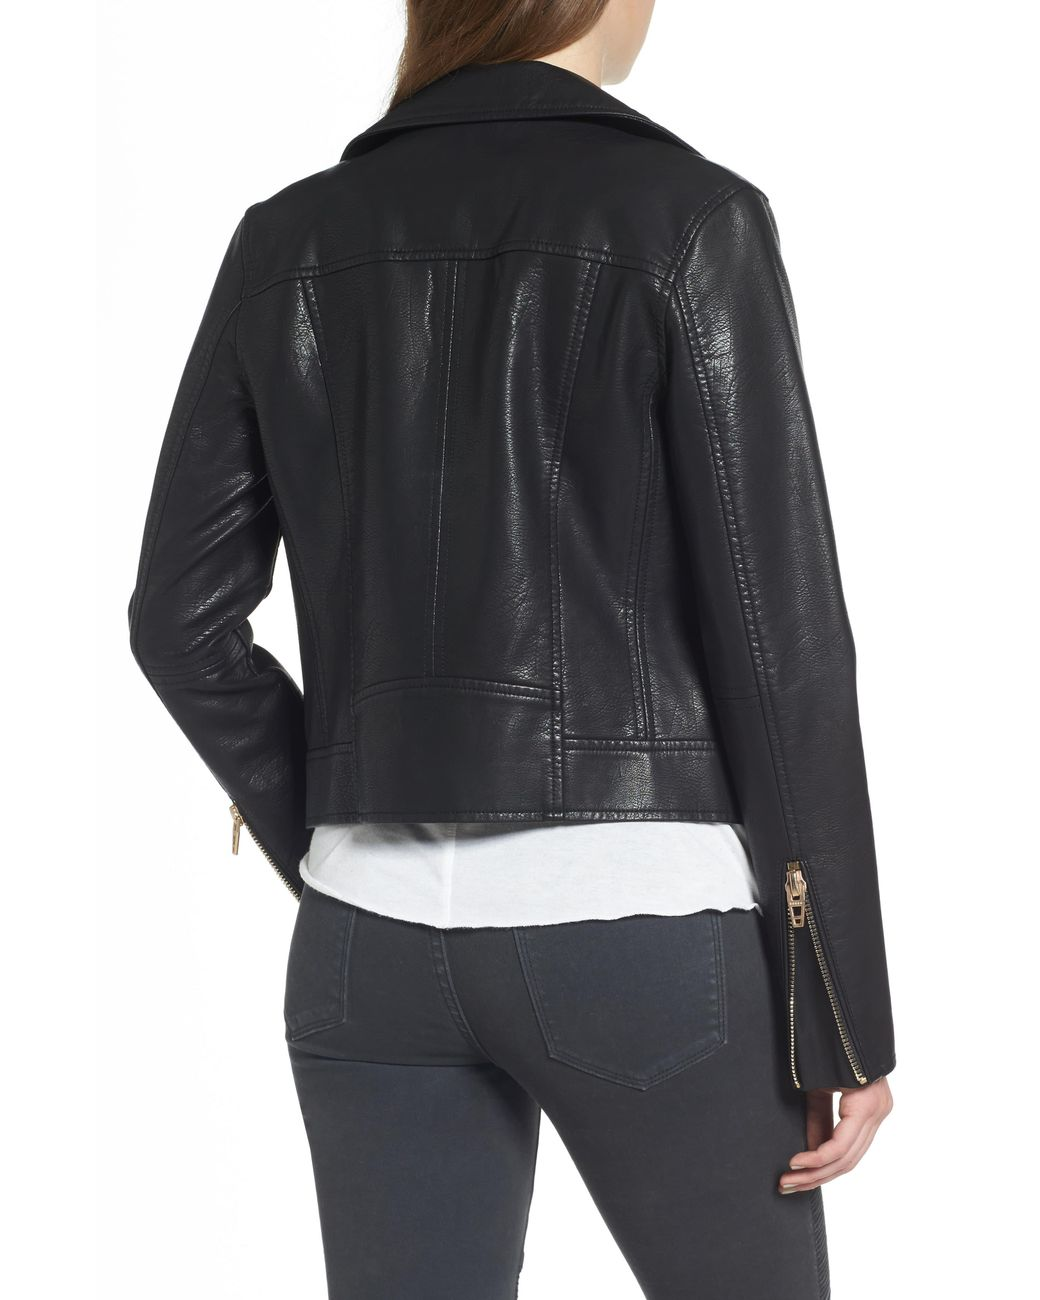 6e1492e1b Women's Black Life Changer Moto Jacket